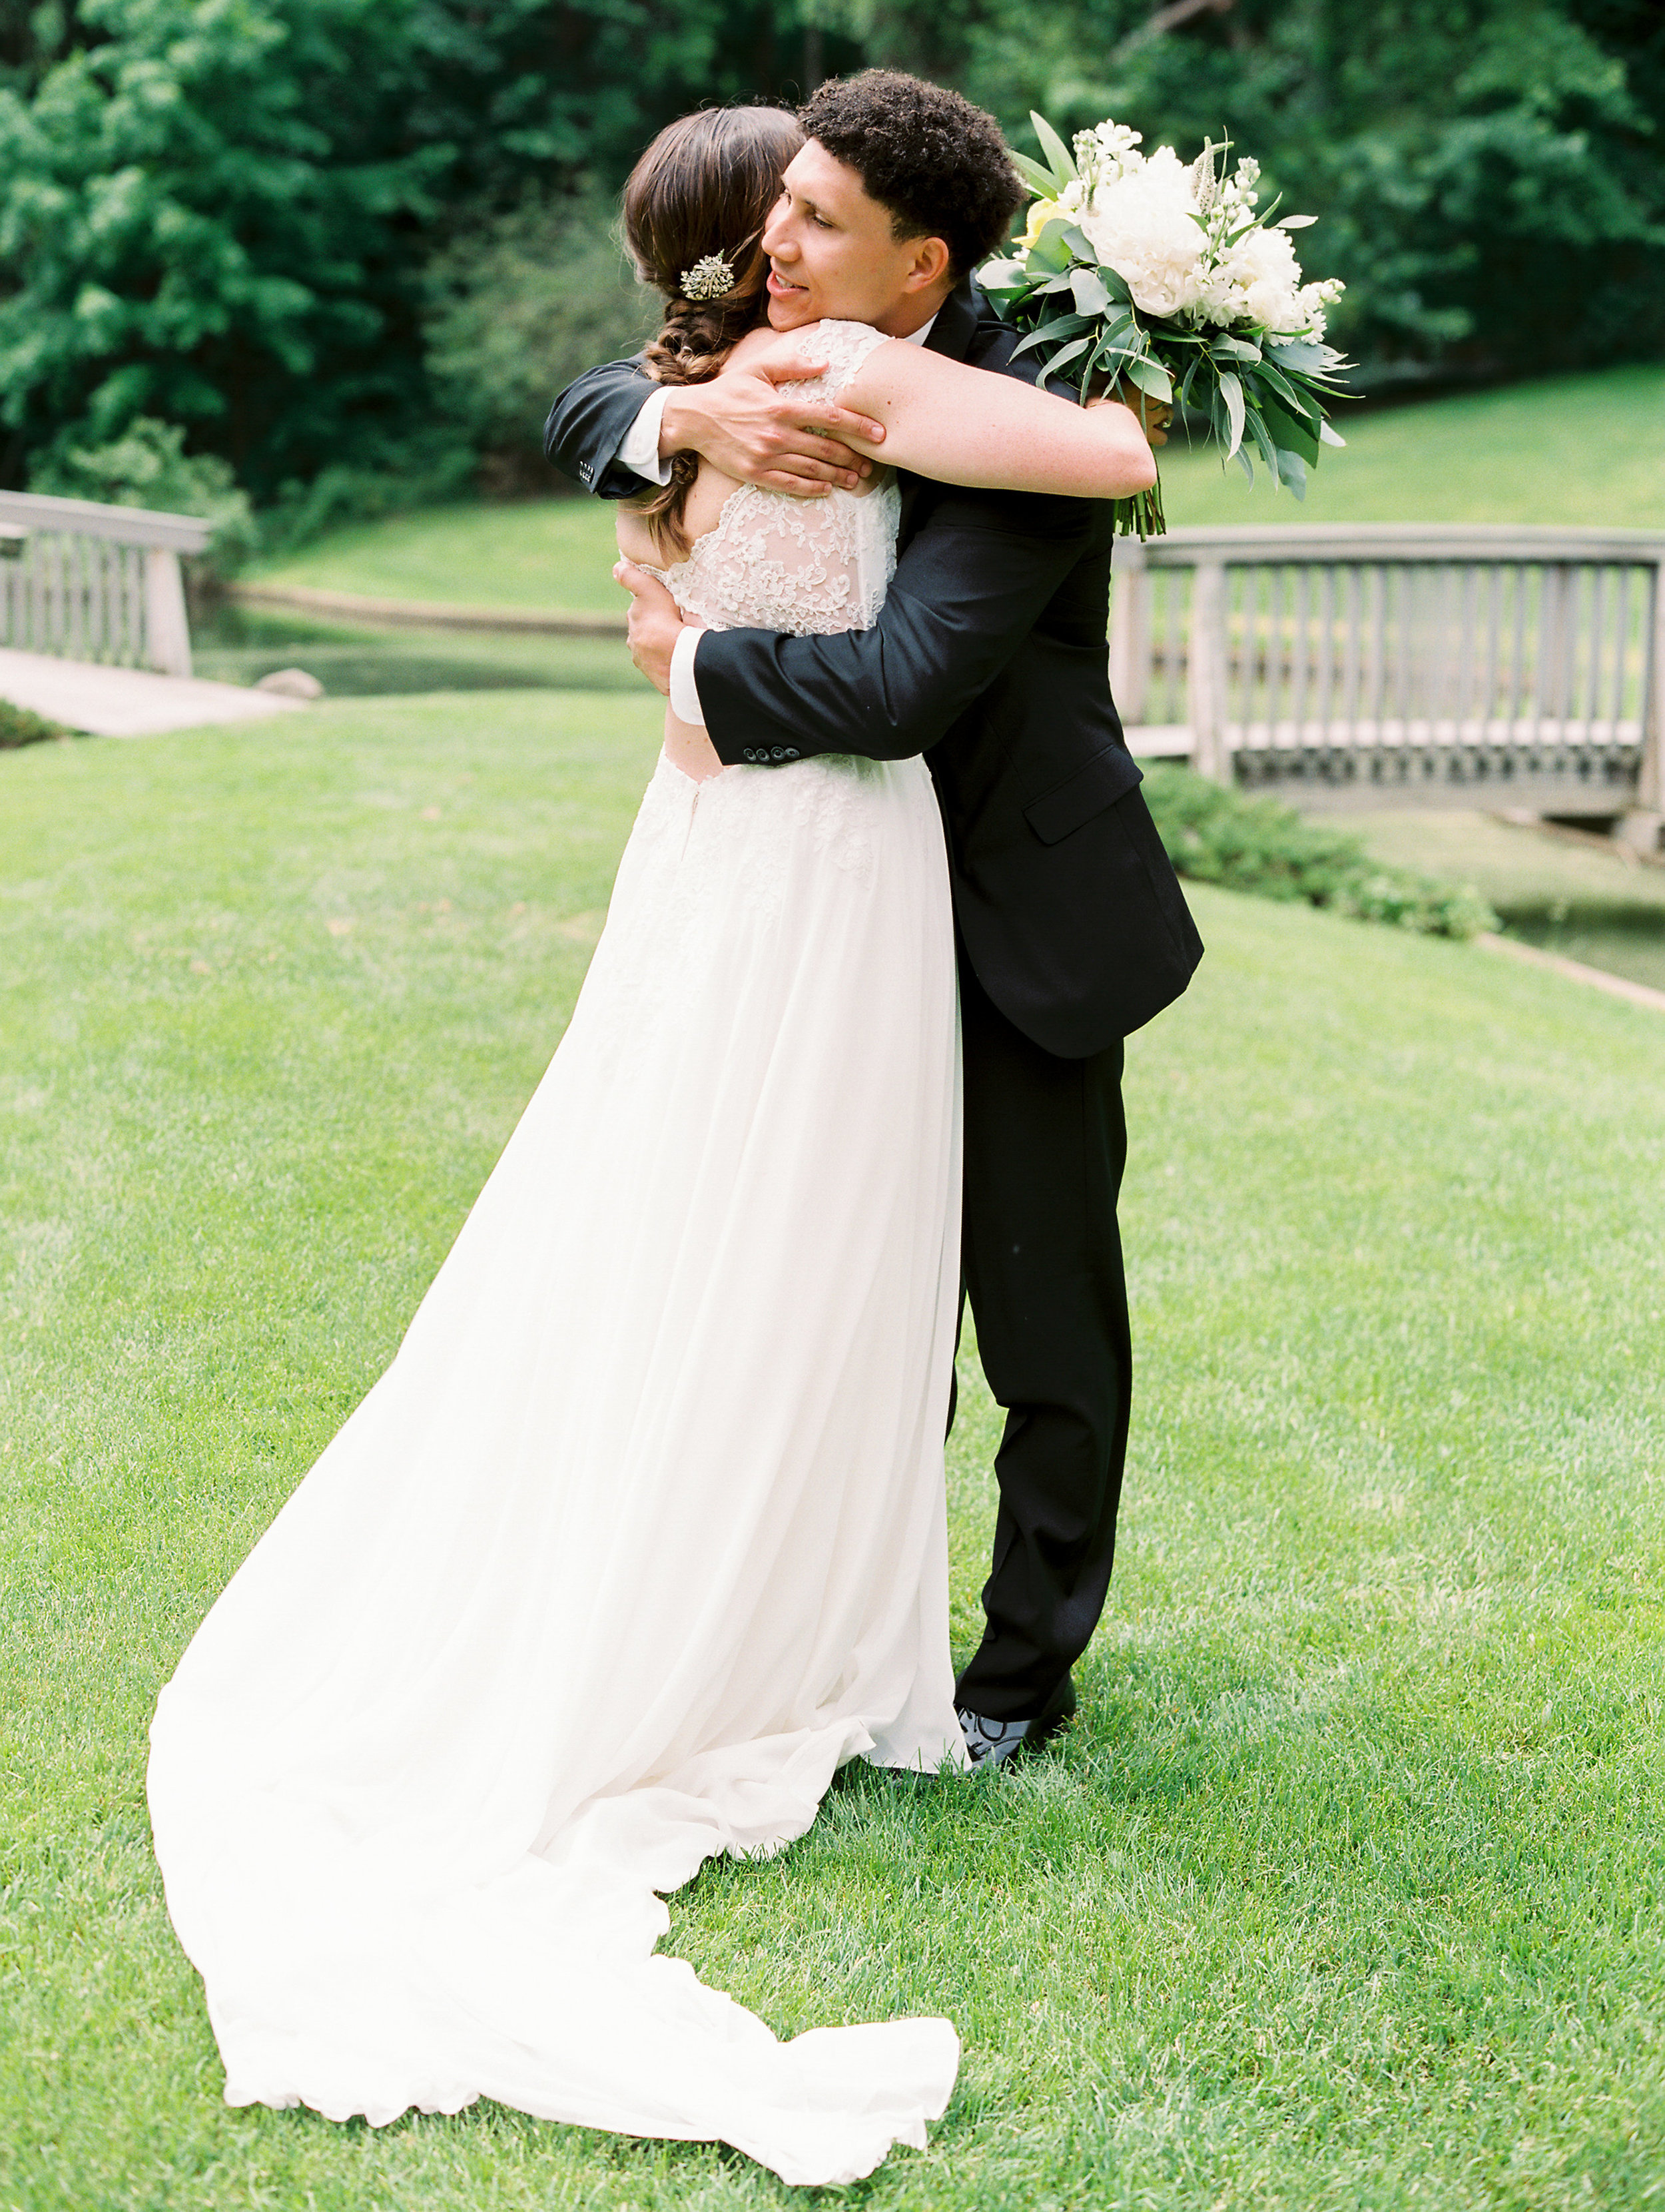 Julius+Wedding+FirstLookf-4.jpg